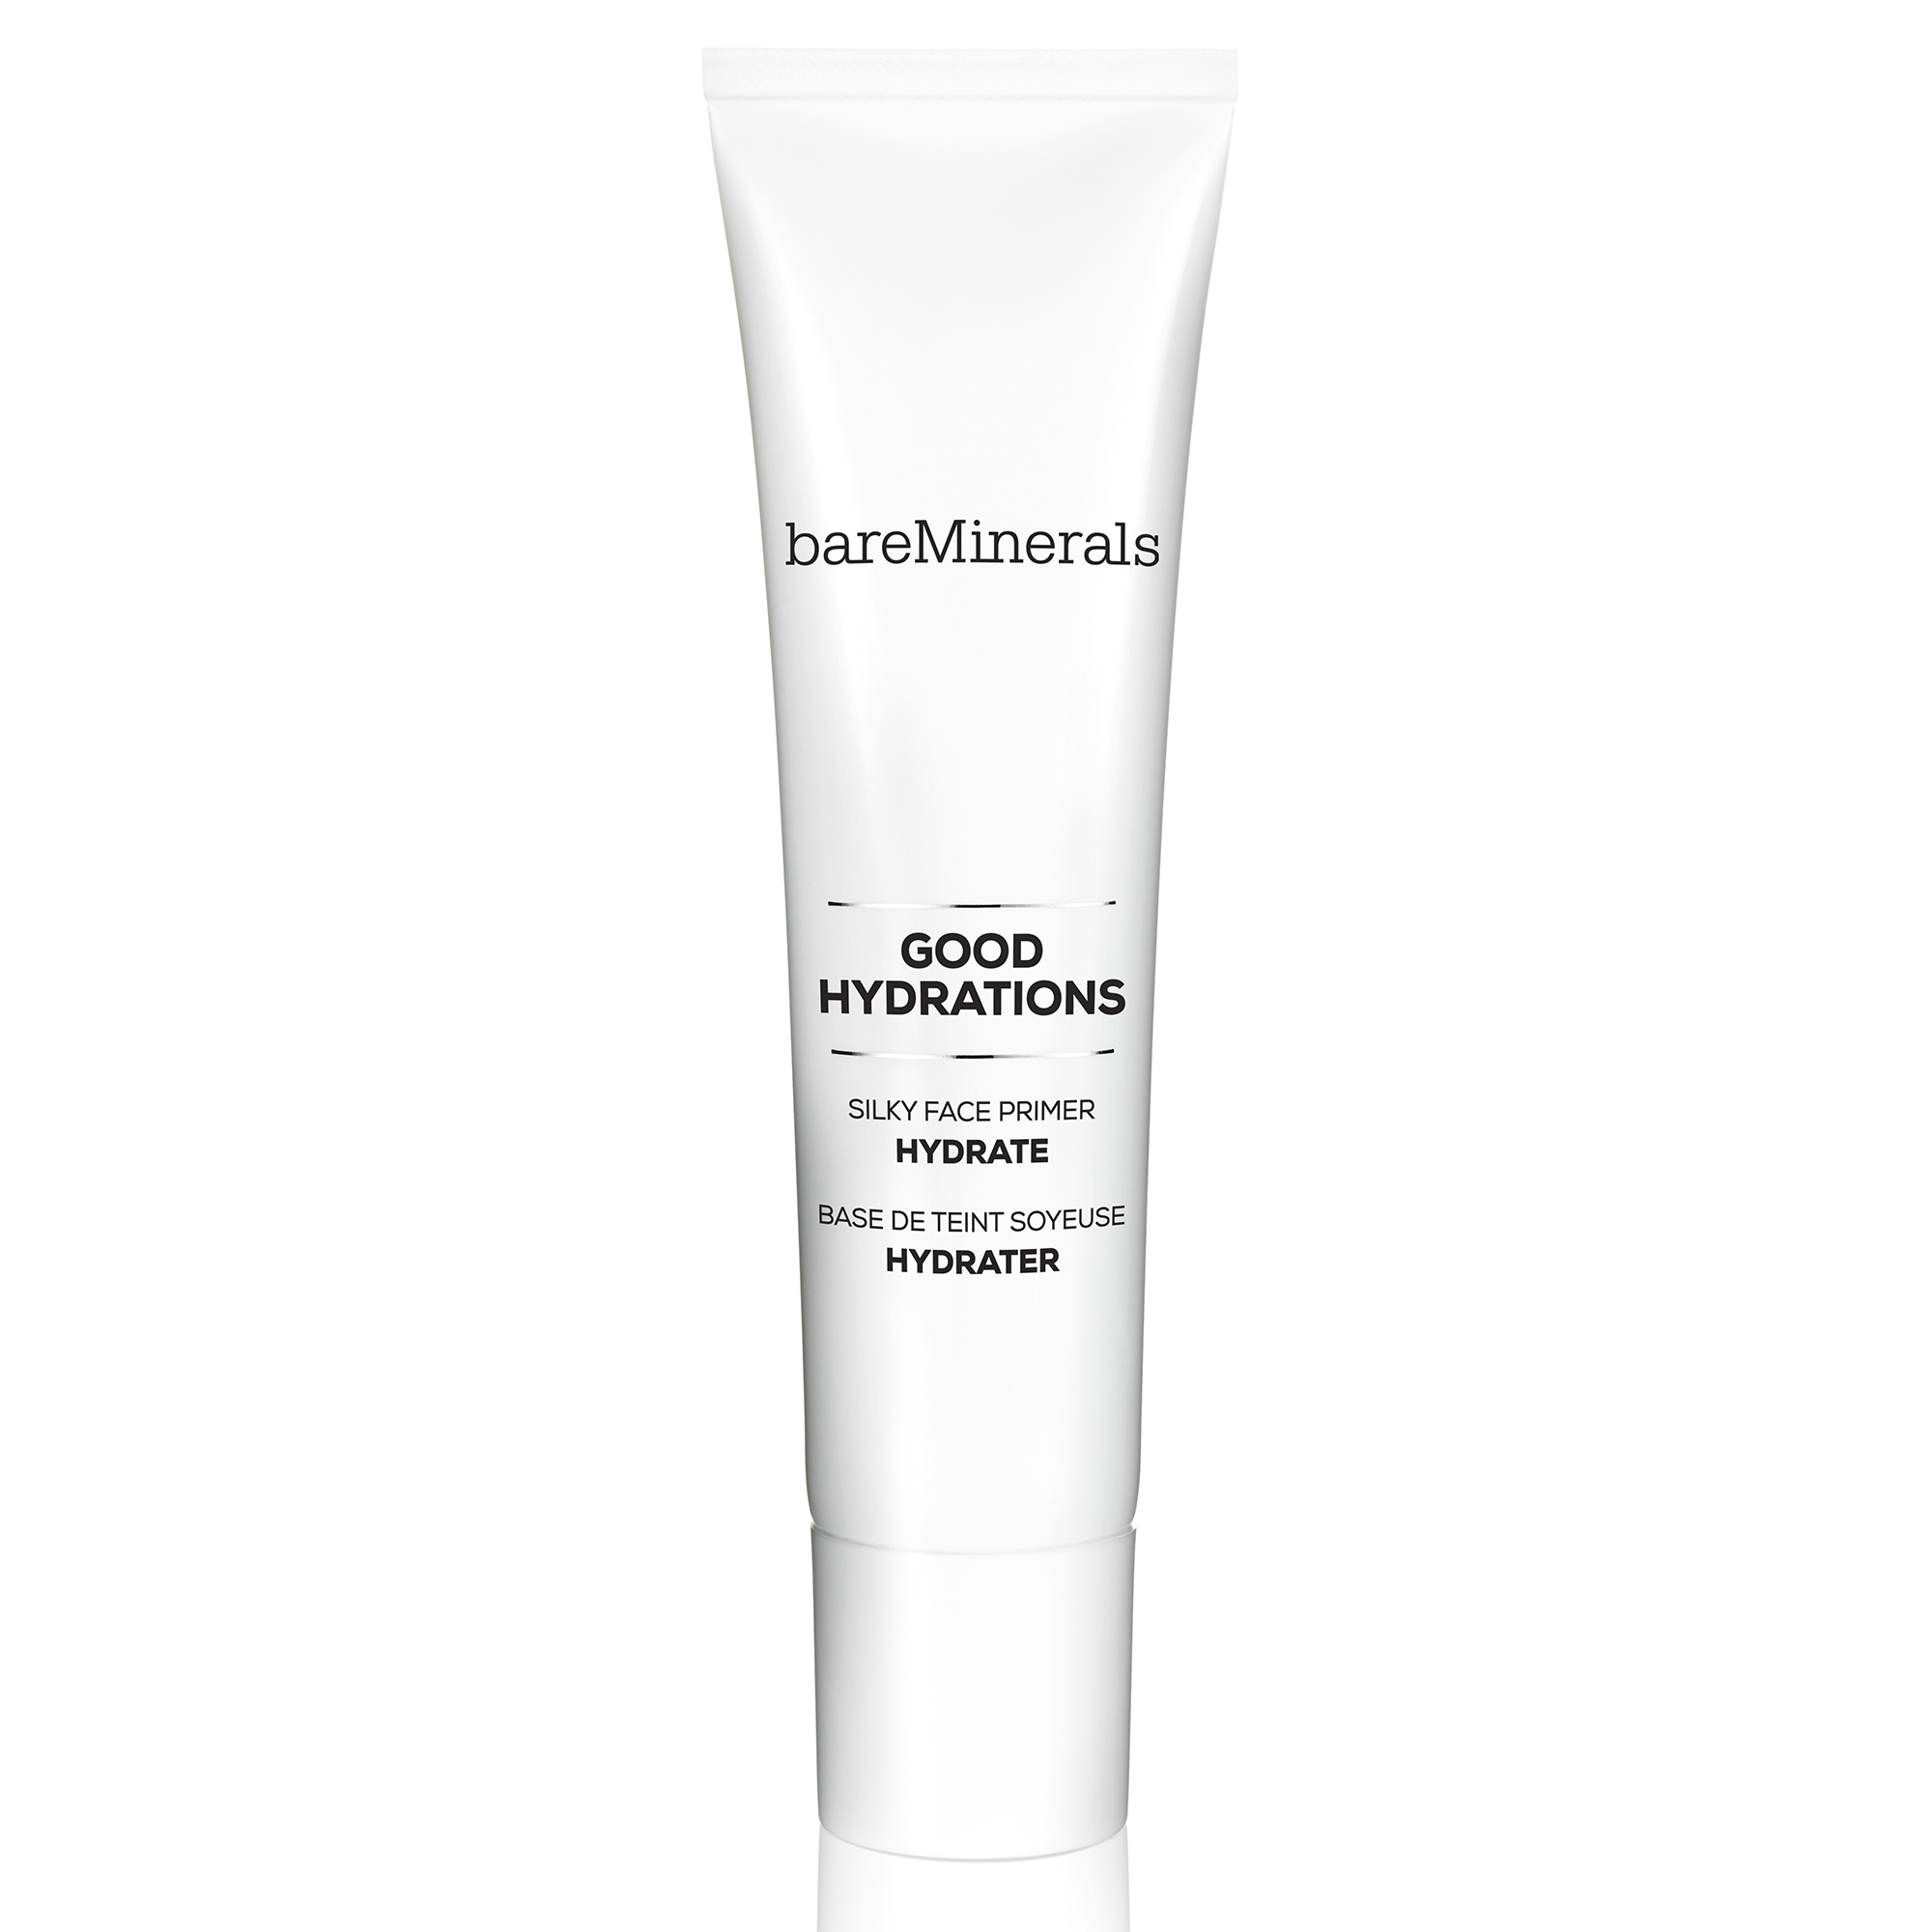 Good Hydrations Silky Face Primer 30ml